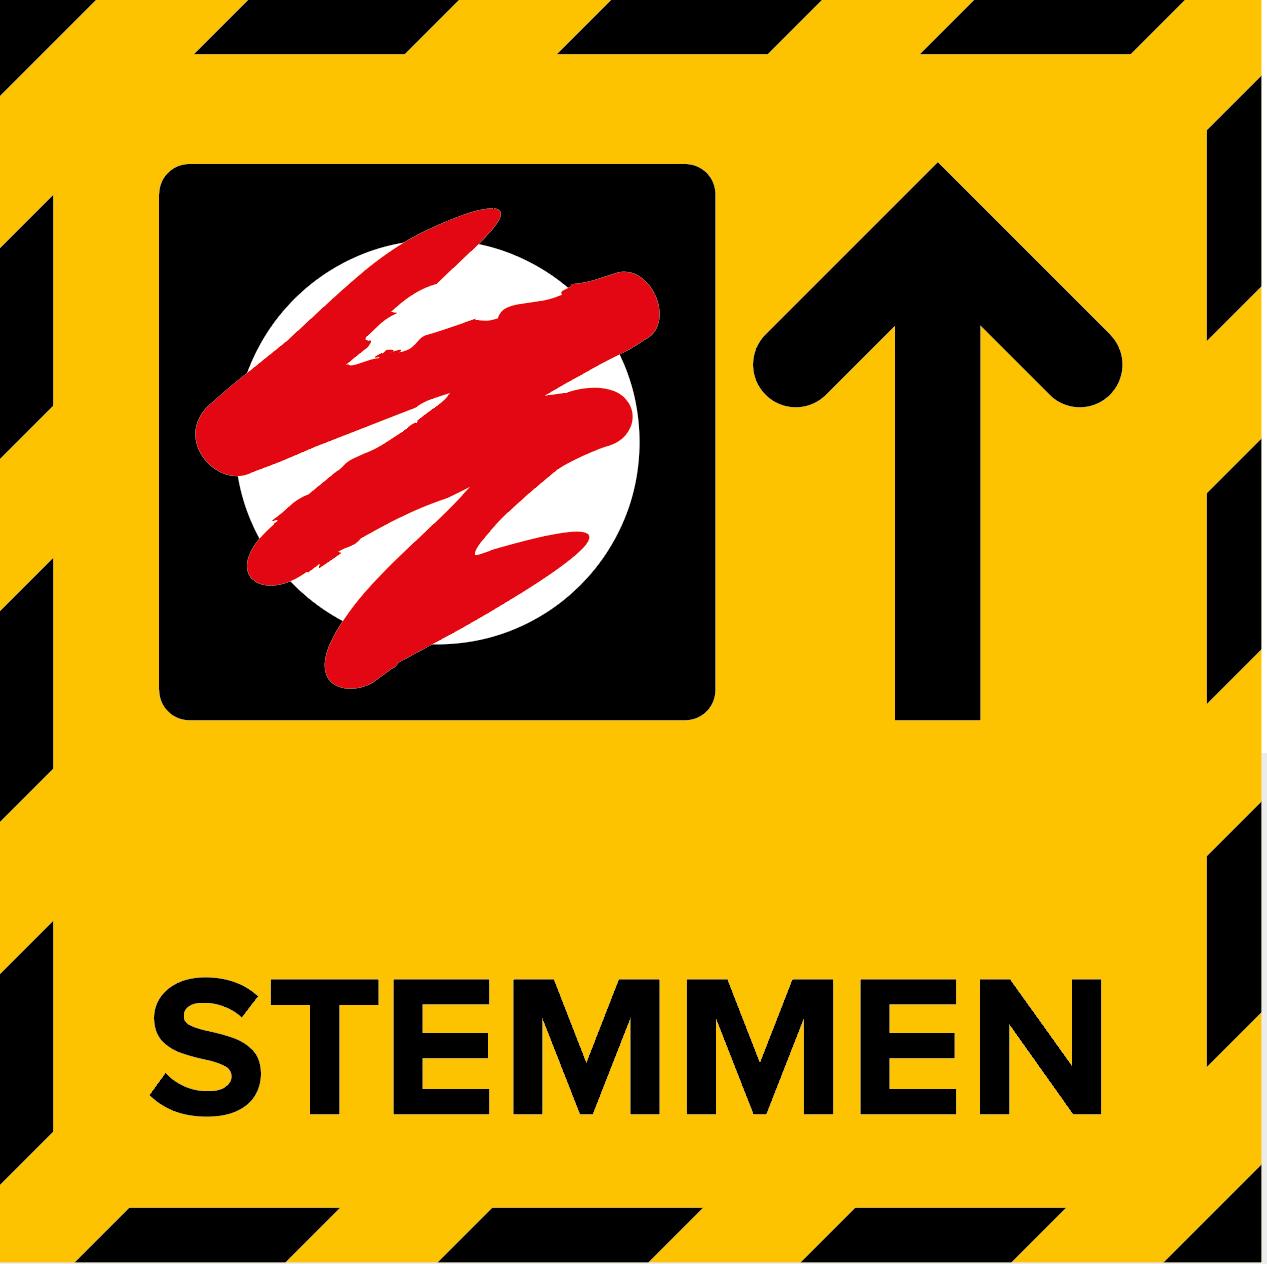 Metromark + Igepa vloerlaminaat Stembureau sticker routing (15 x 15 CM)